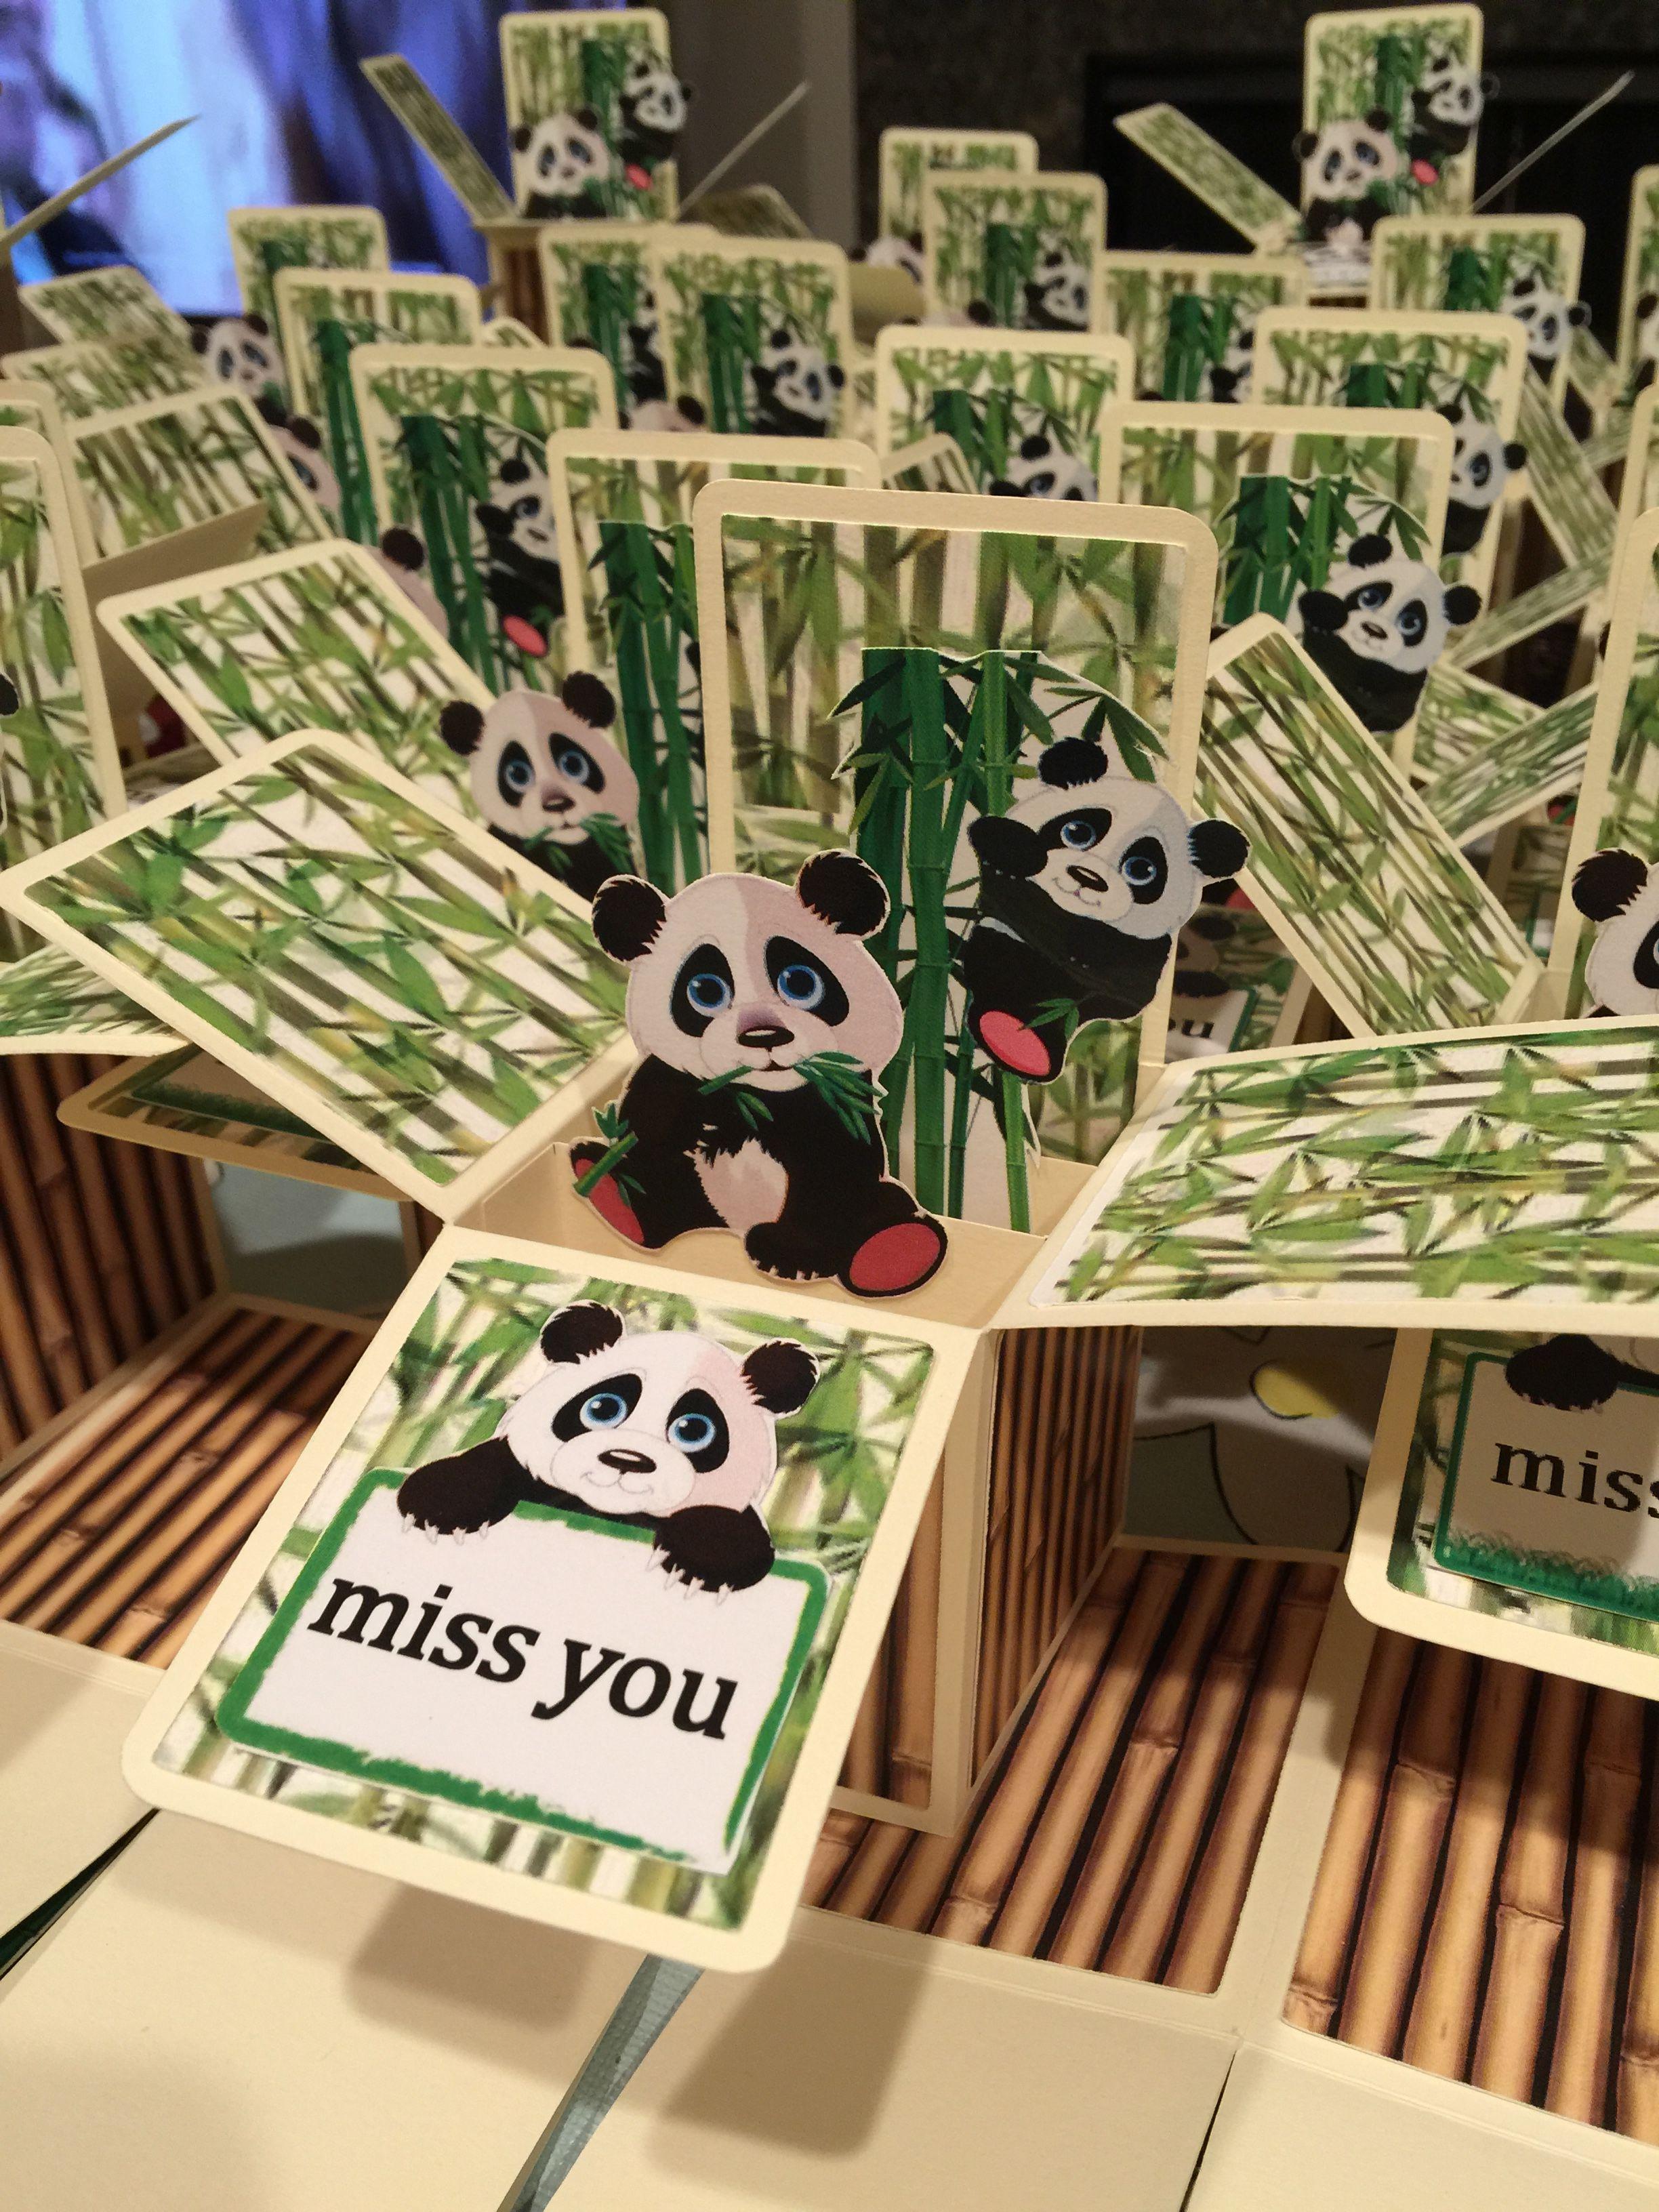 Panda Miss You Pop Up Box Card Pop Up Box Cards Card Box Pop Up Cards